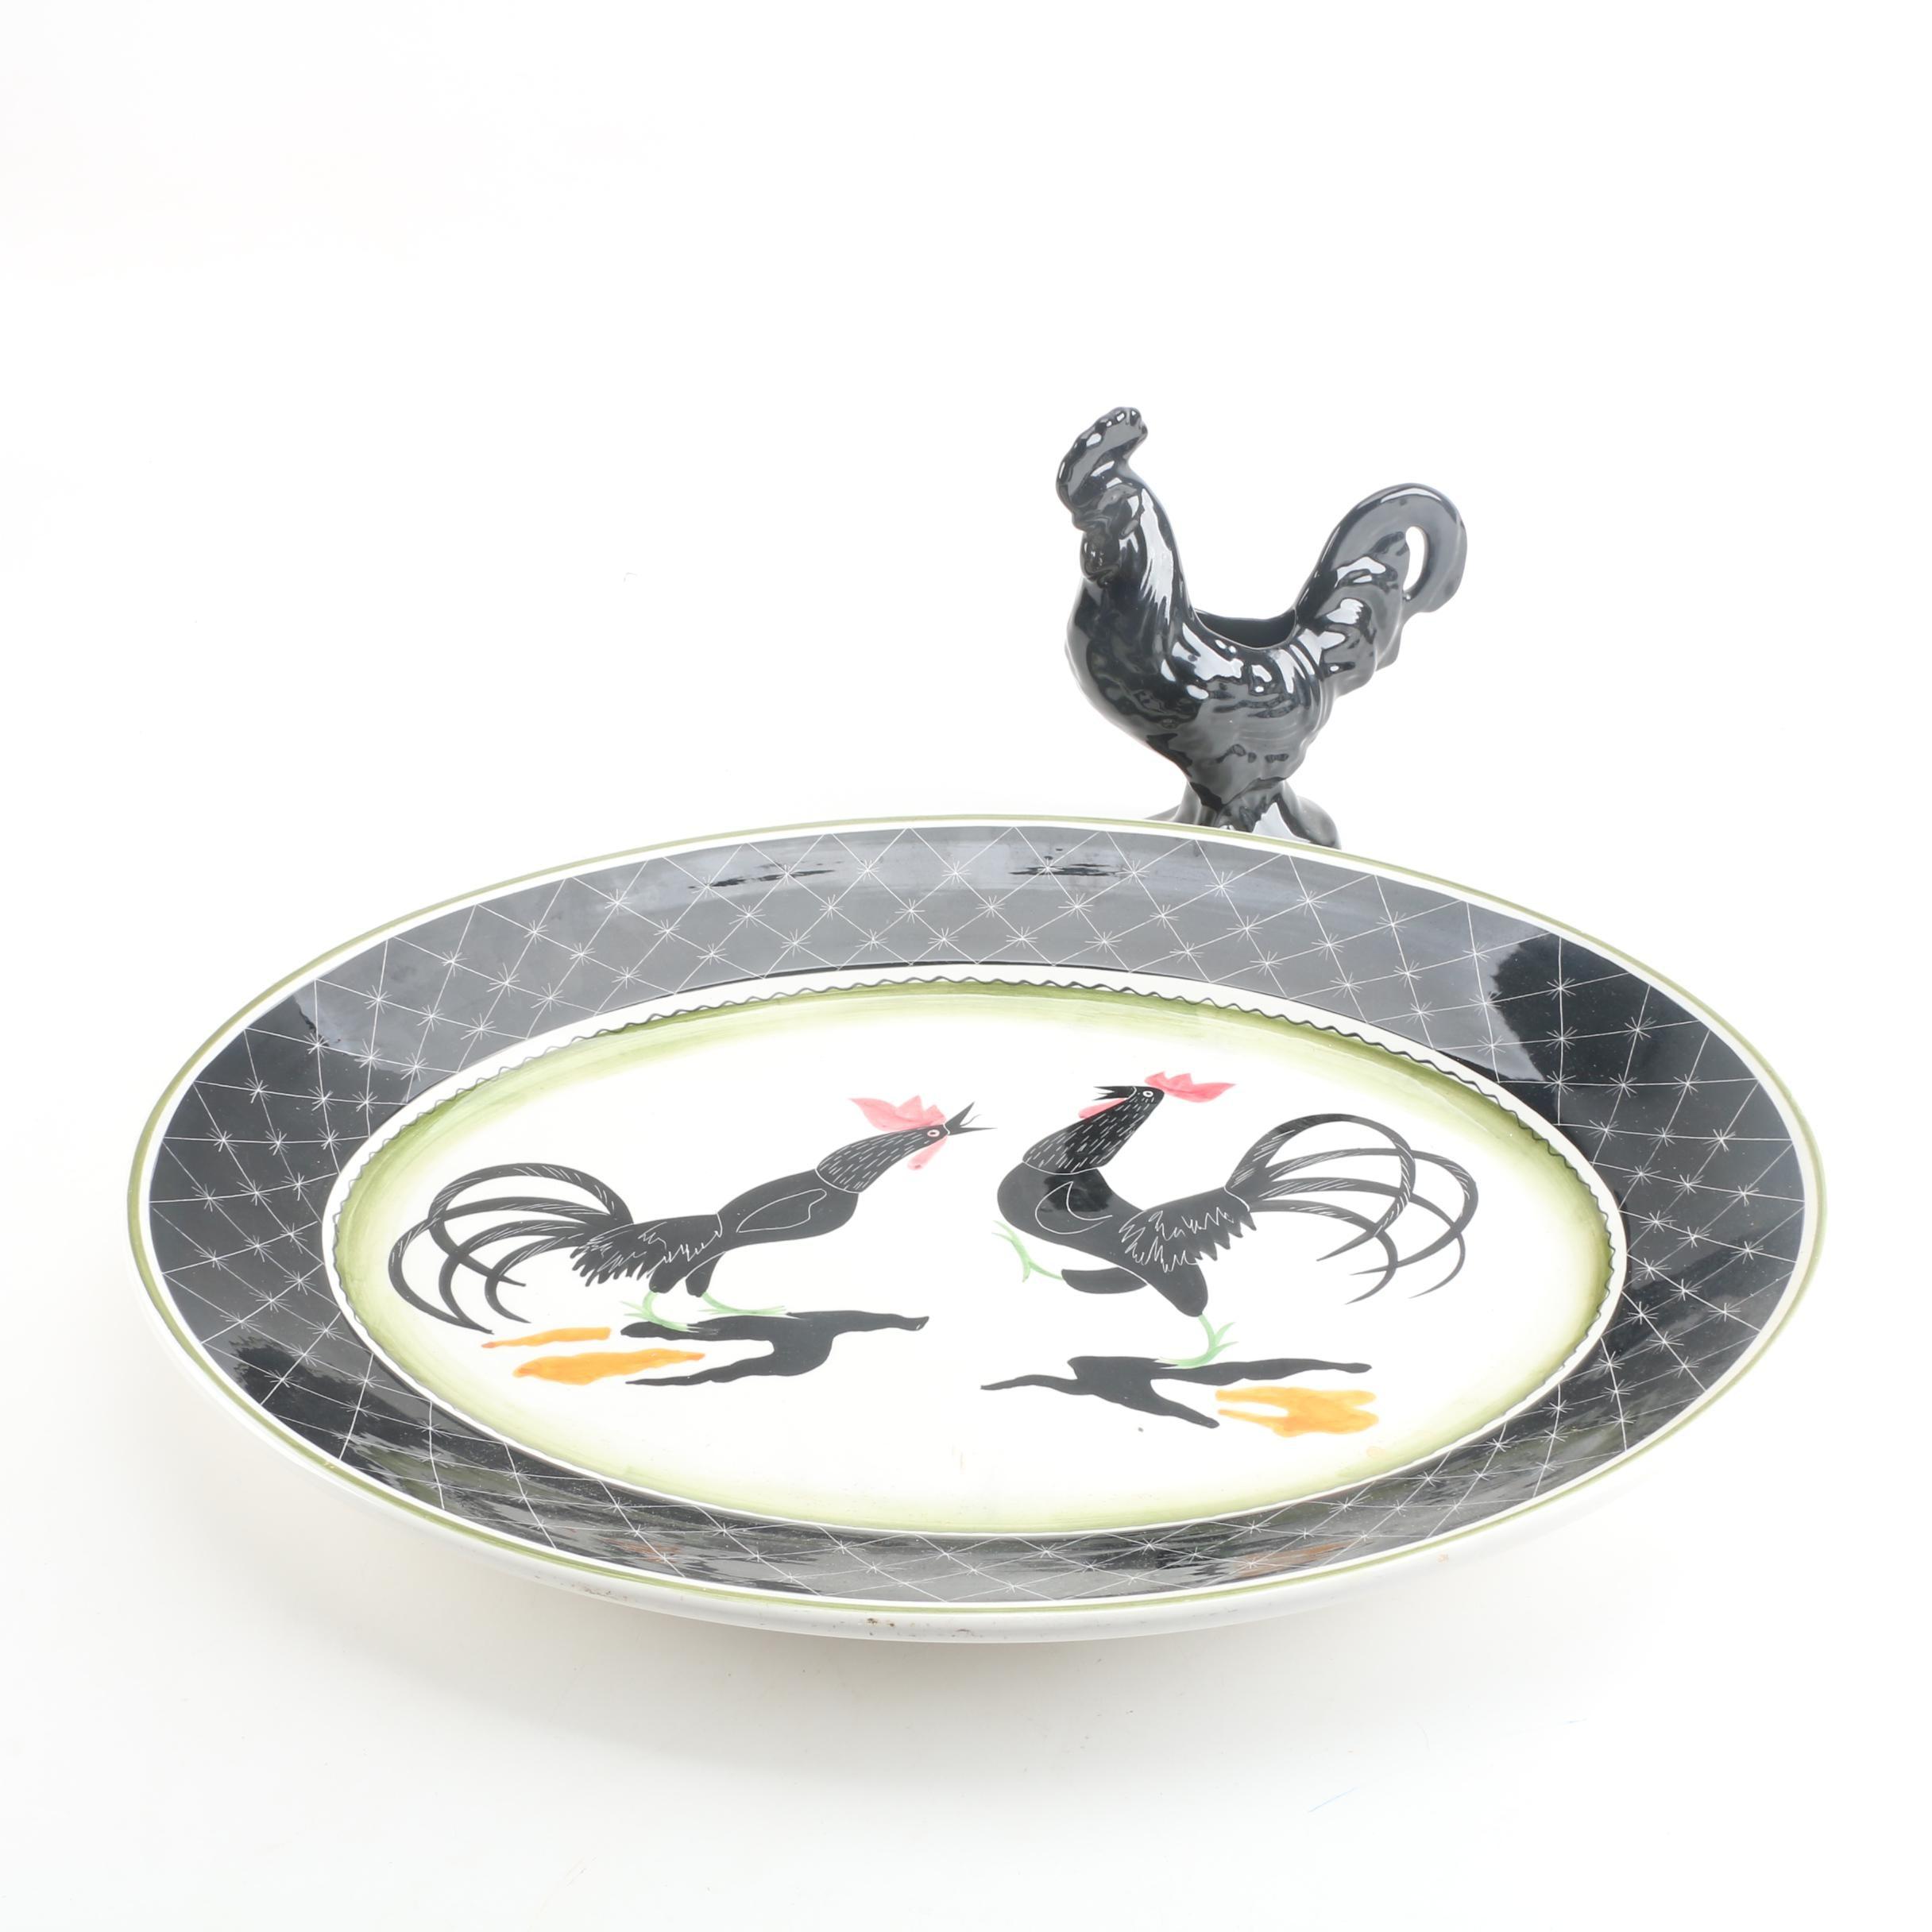 Italian Ceramic Platter with Rooster Vase